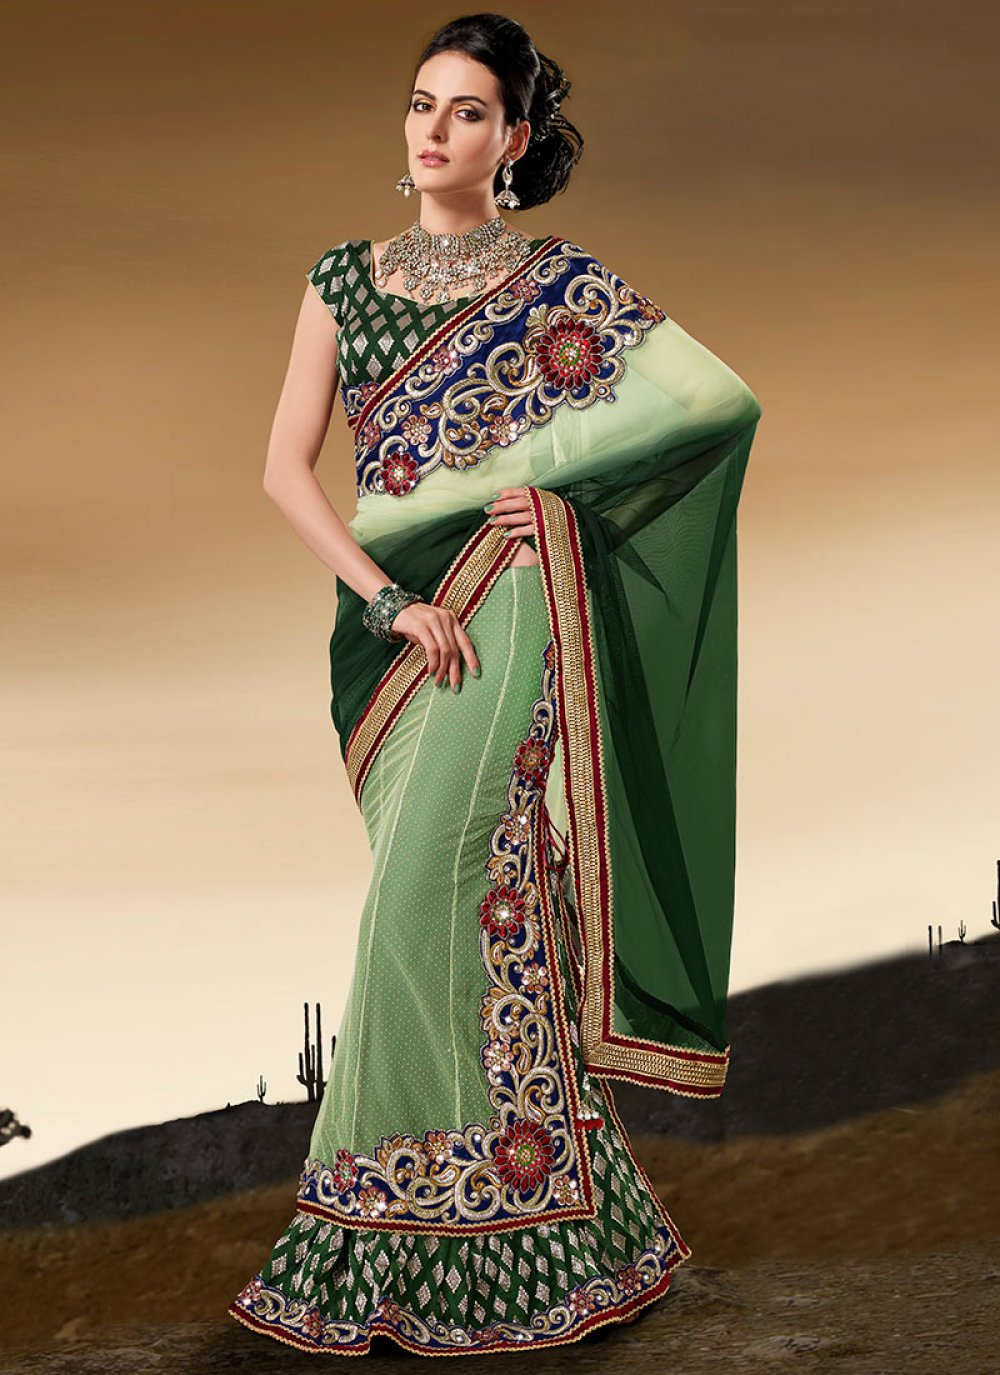 Shaded Green Net Panelled Lehenga Saree